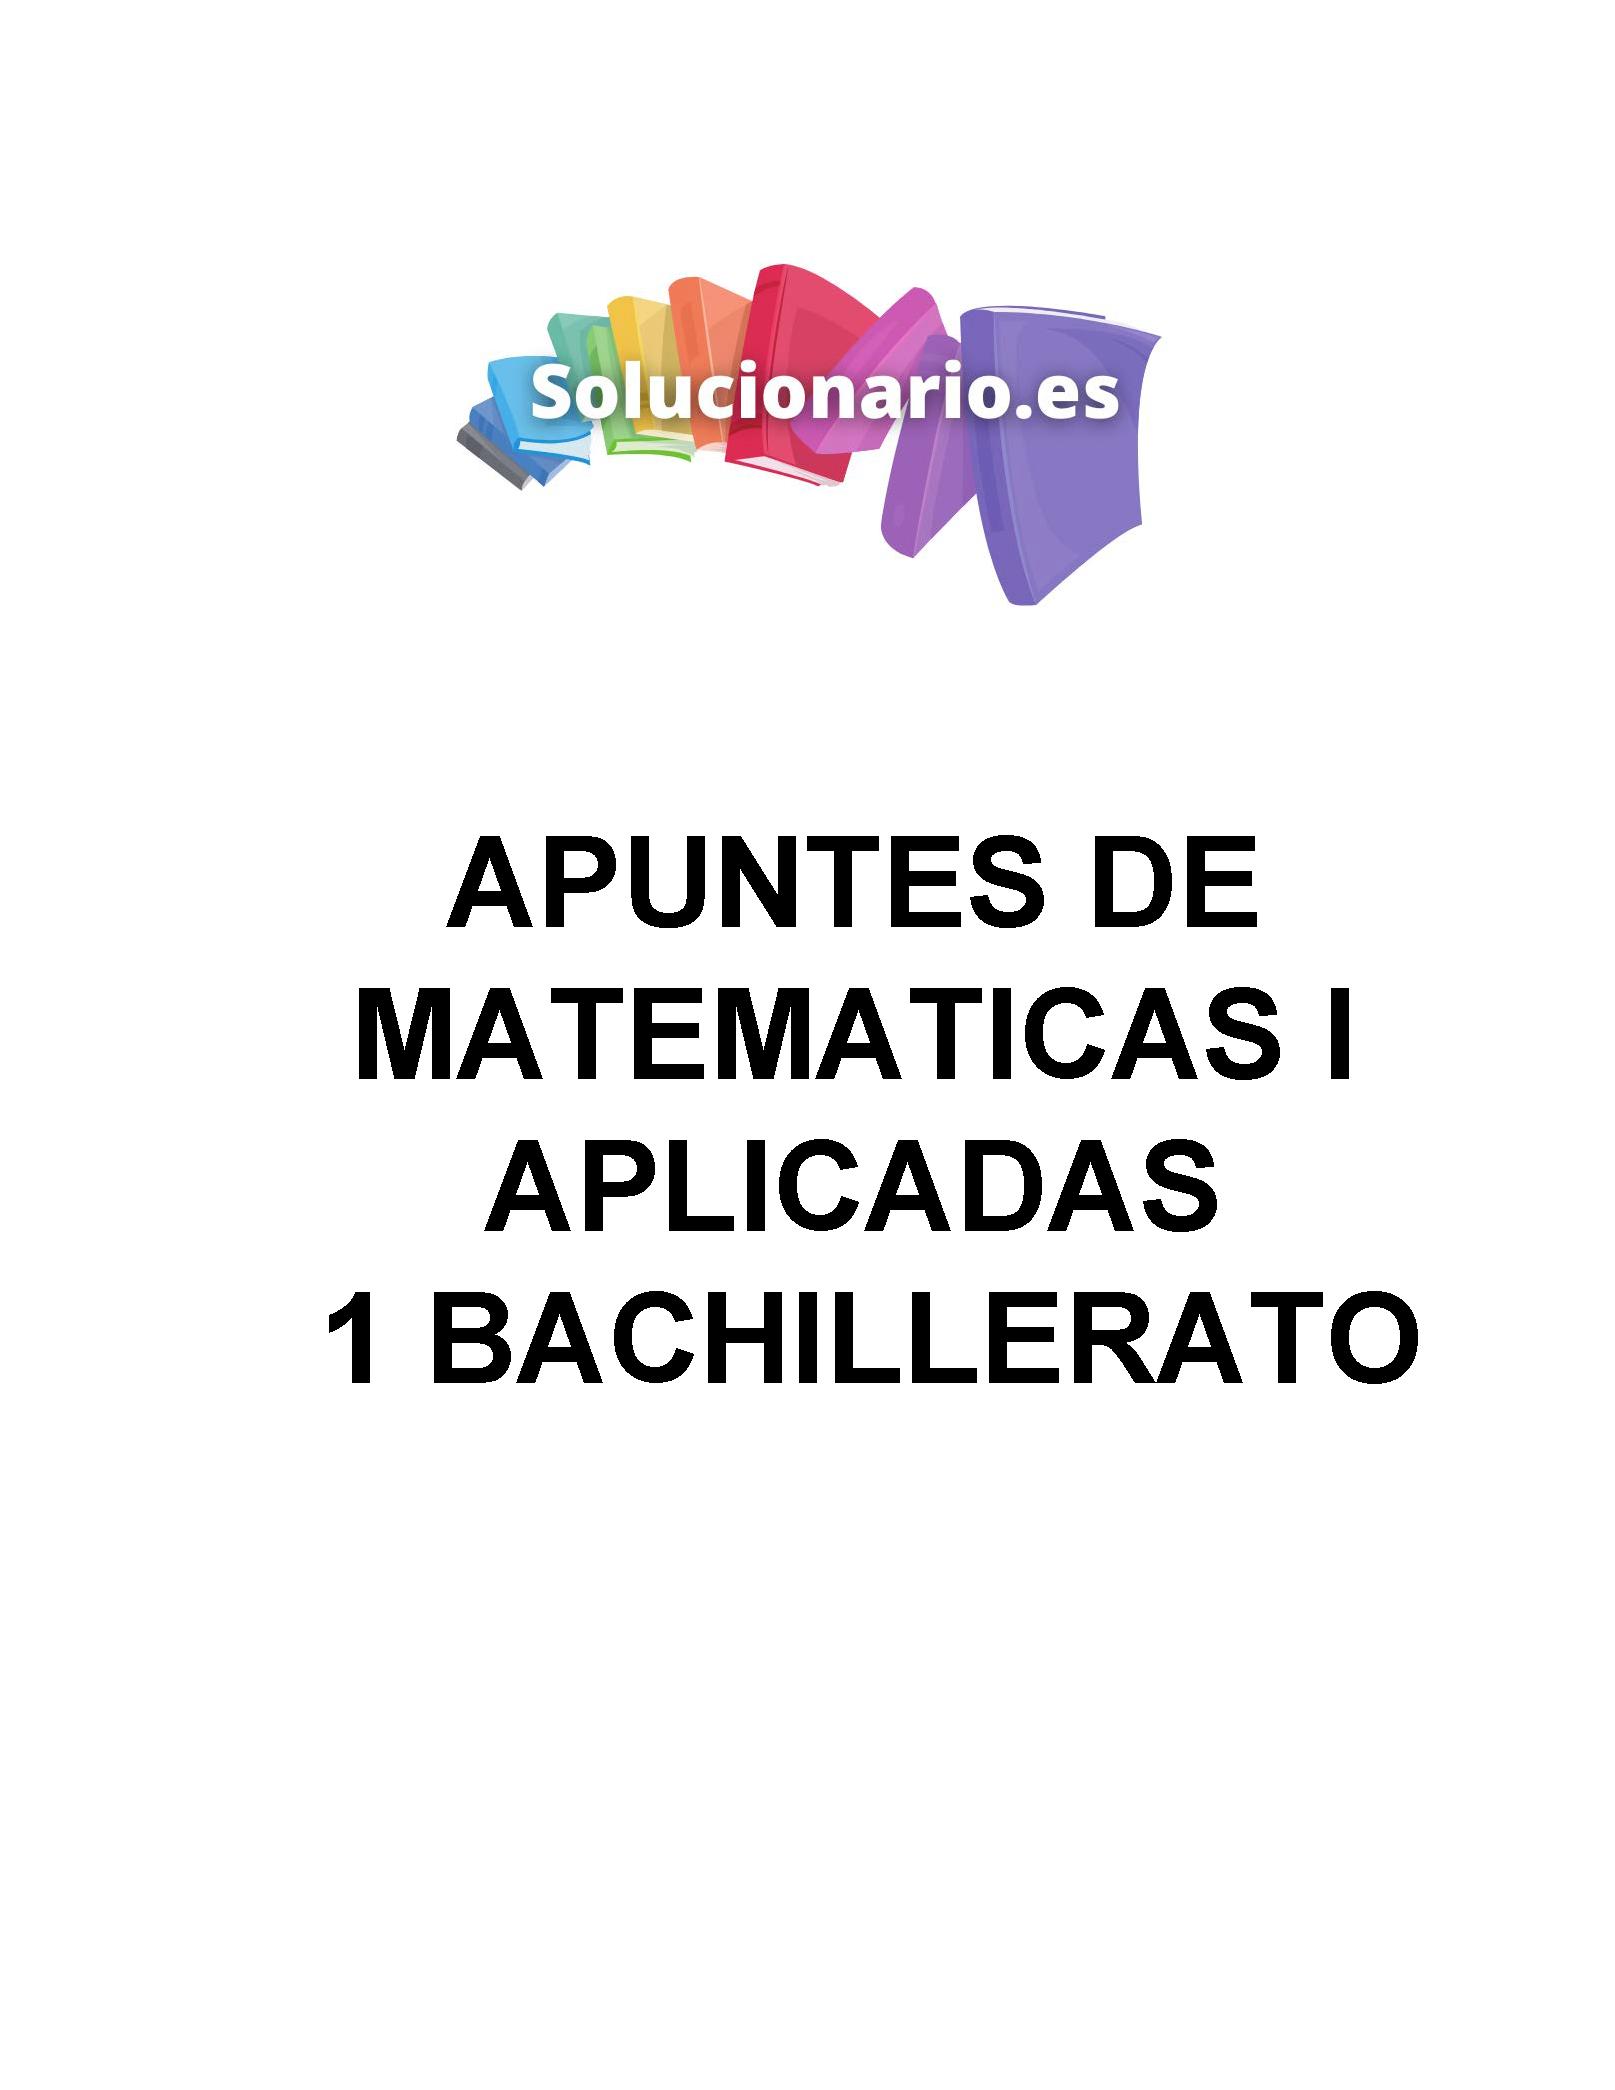 Apuntes Matemáticas Álgebra 1 Bachillerato de Sociales 2020 / 2021